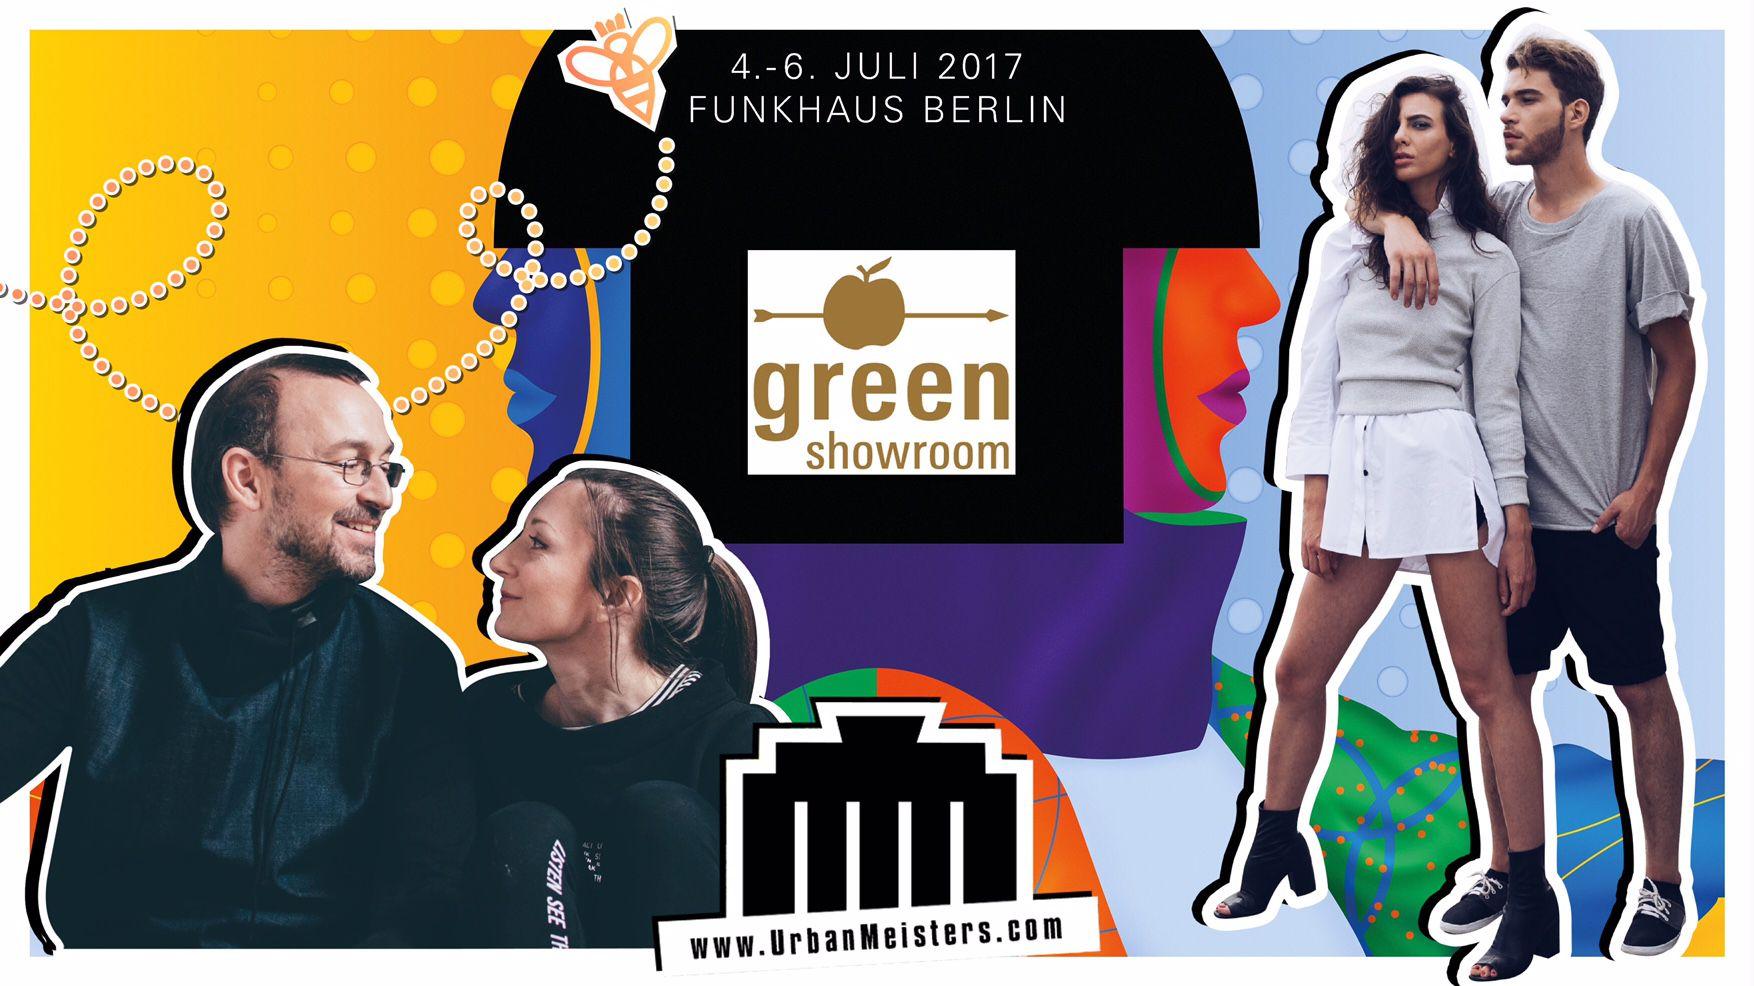 [GREEN FASHION] Meet urban ecofashion brand Movinun from Berlin Fashion Week